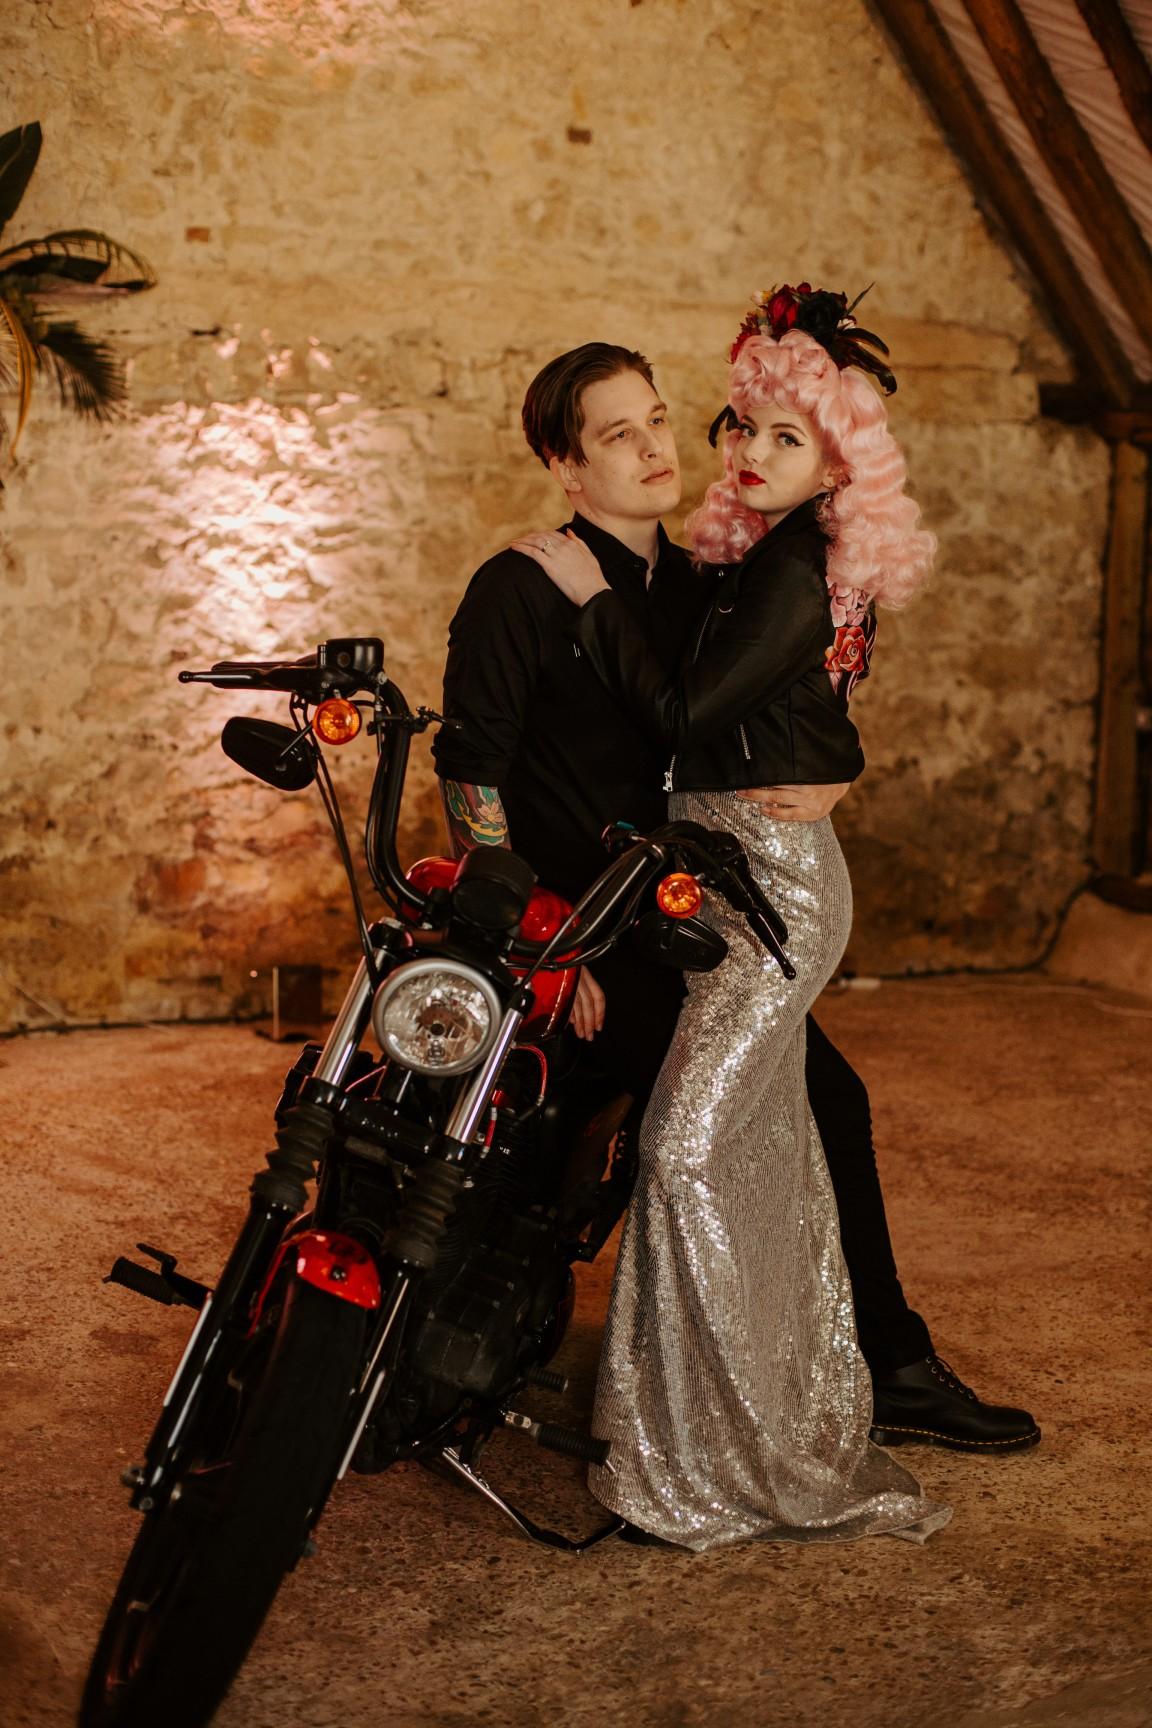 rock and roll wedding - edgy wedding inspiration - rock and roll bride - bridal leather jacket - harley davidson wedding